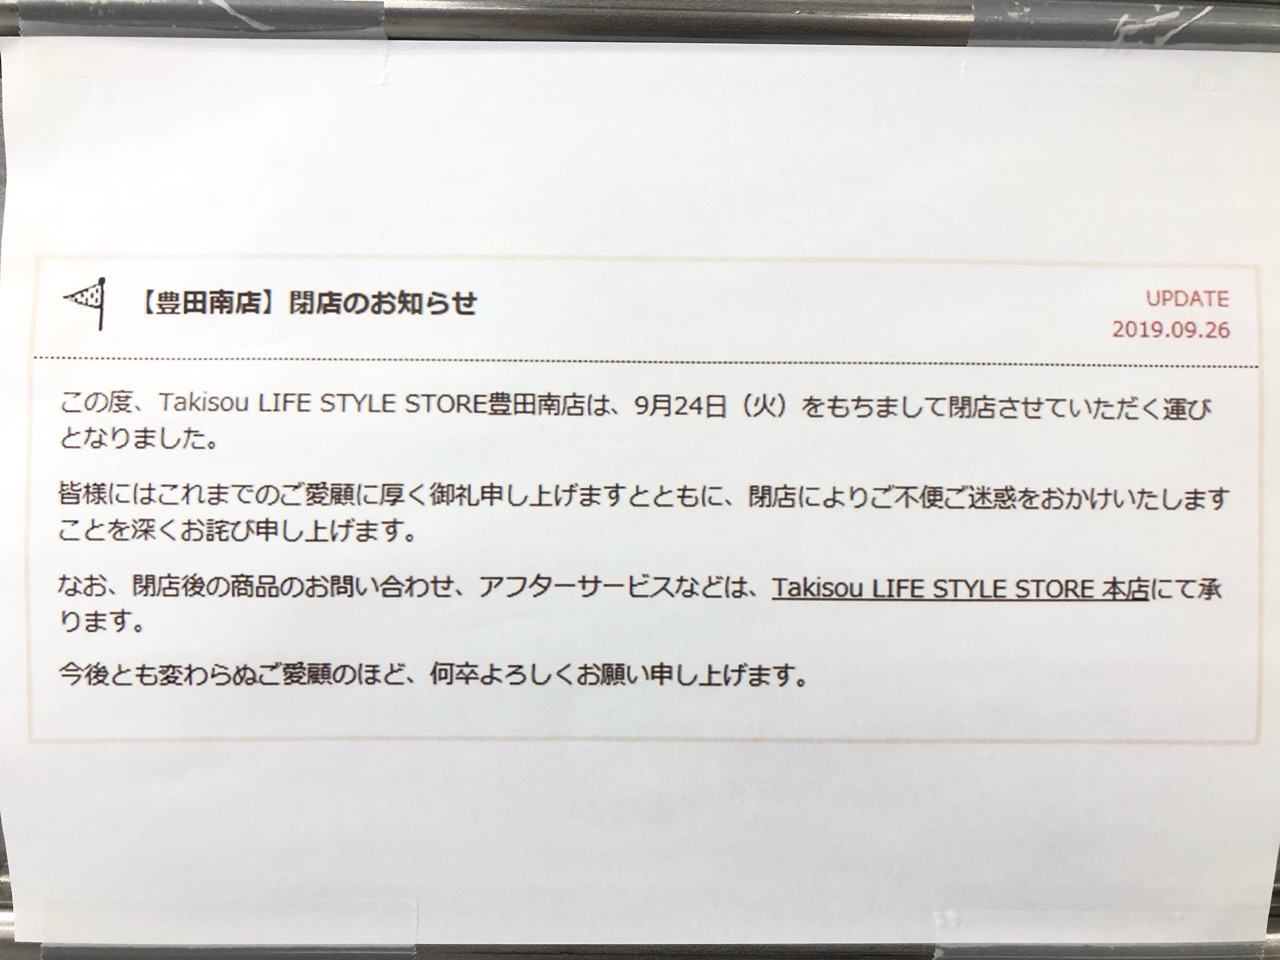 「Takisou LIFE STYLE STORE 豊田南店」